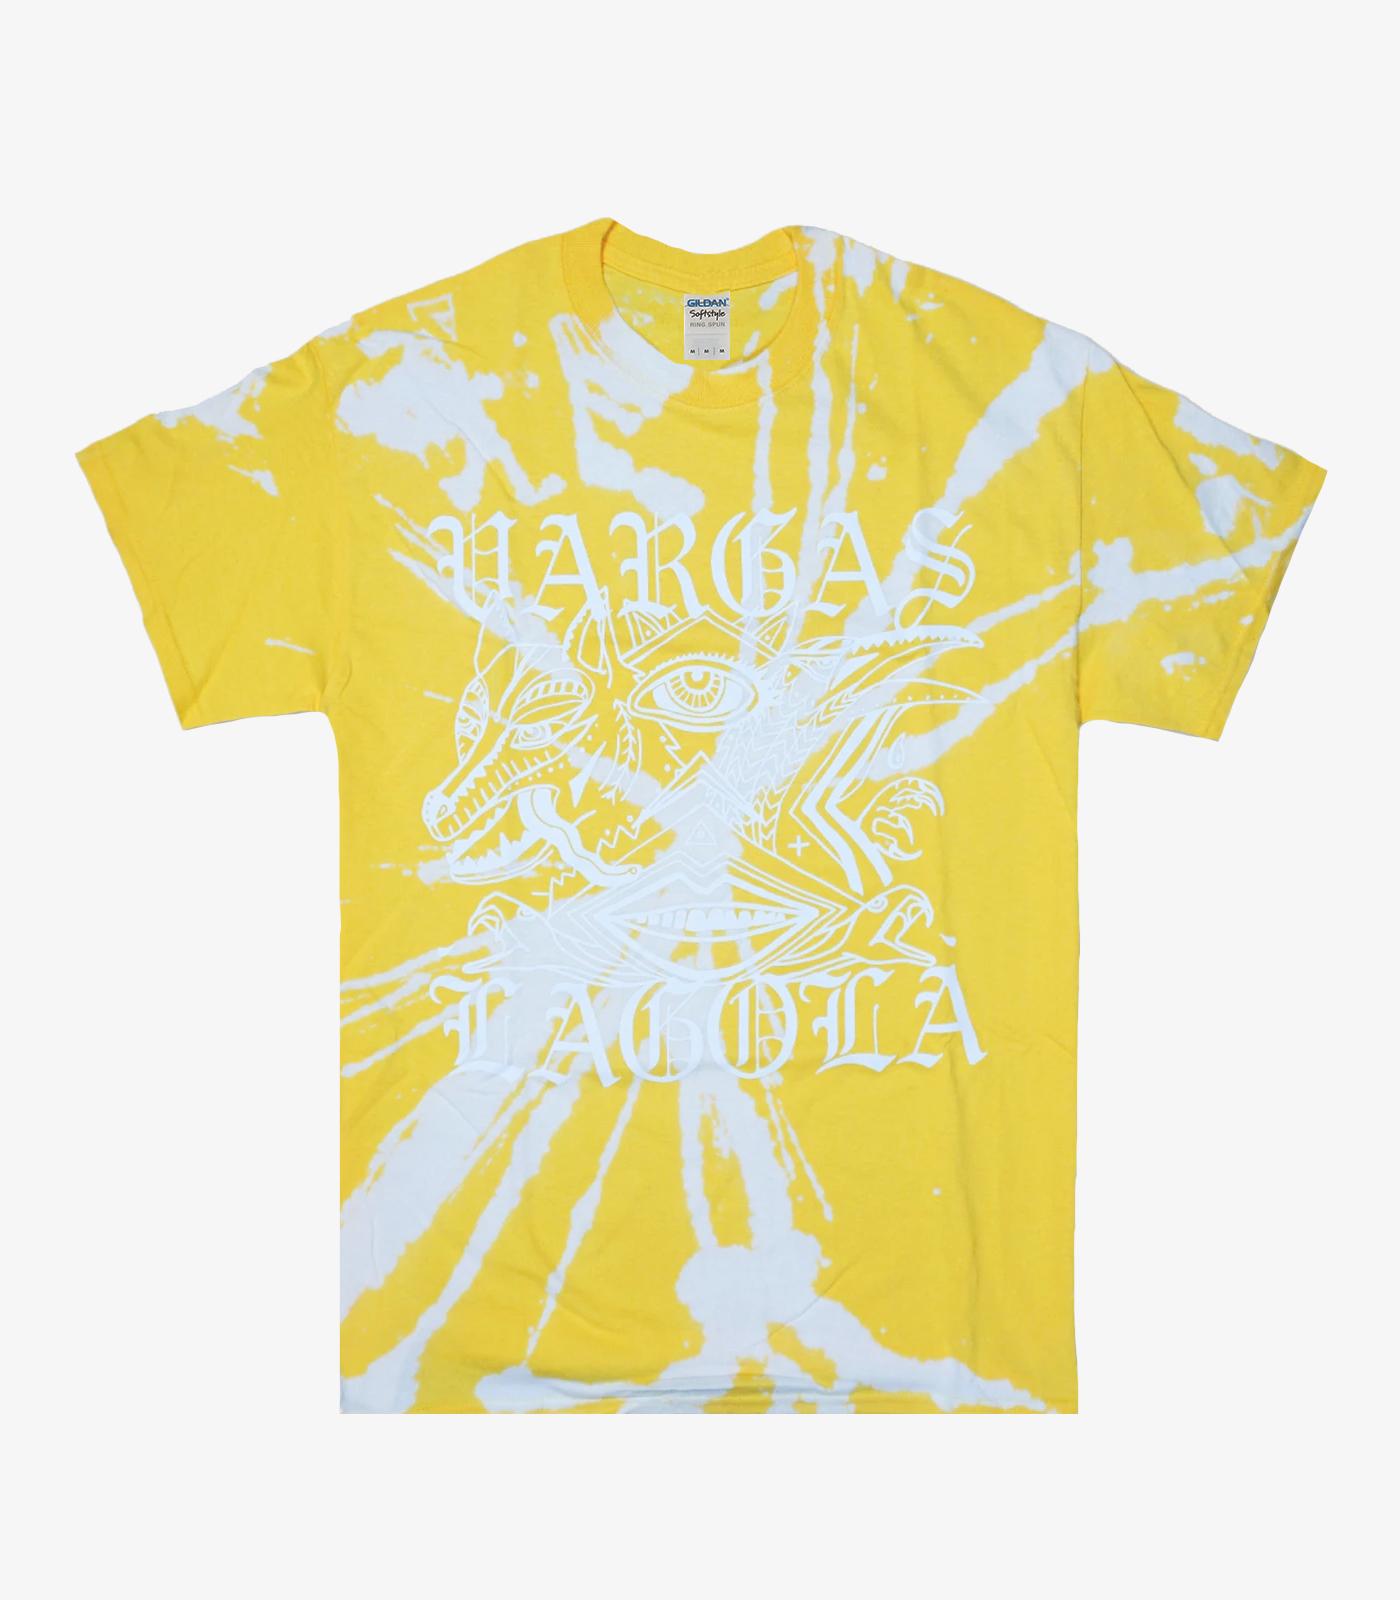 Goth Tie-Dye Yellow